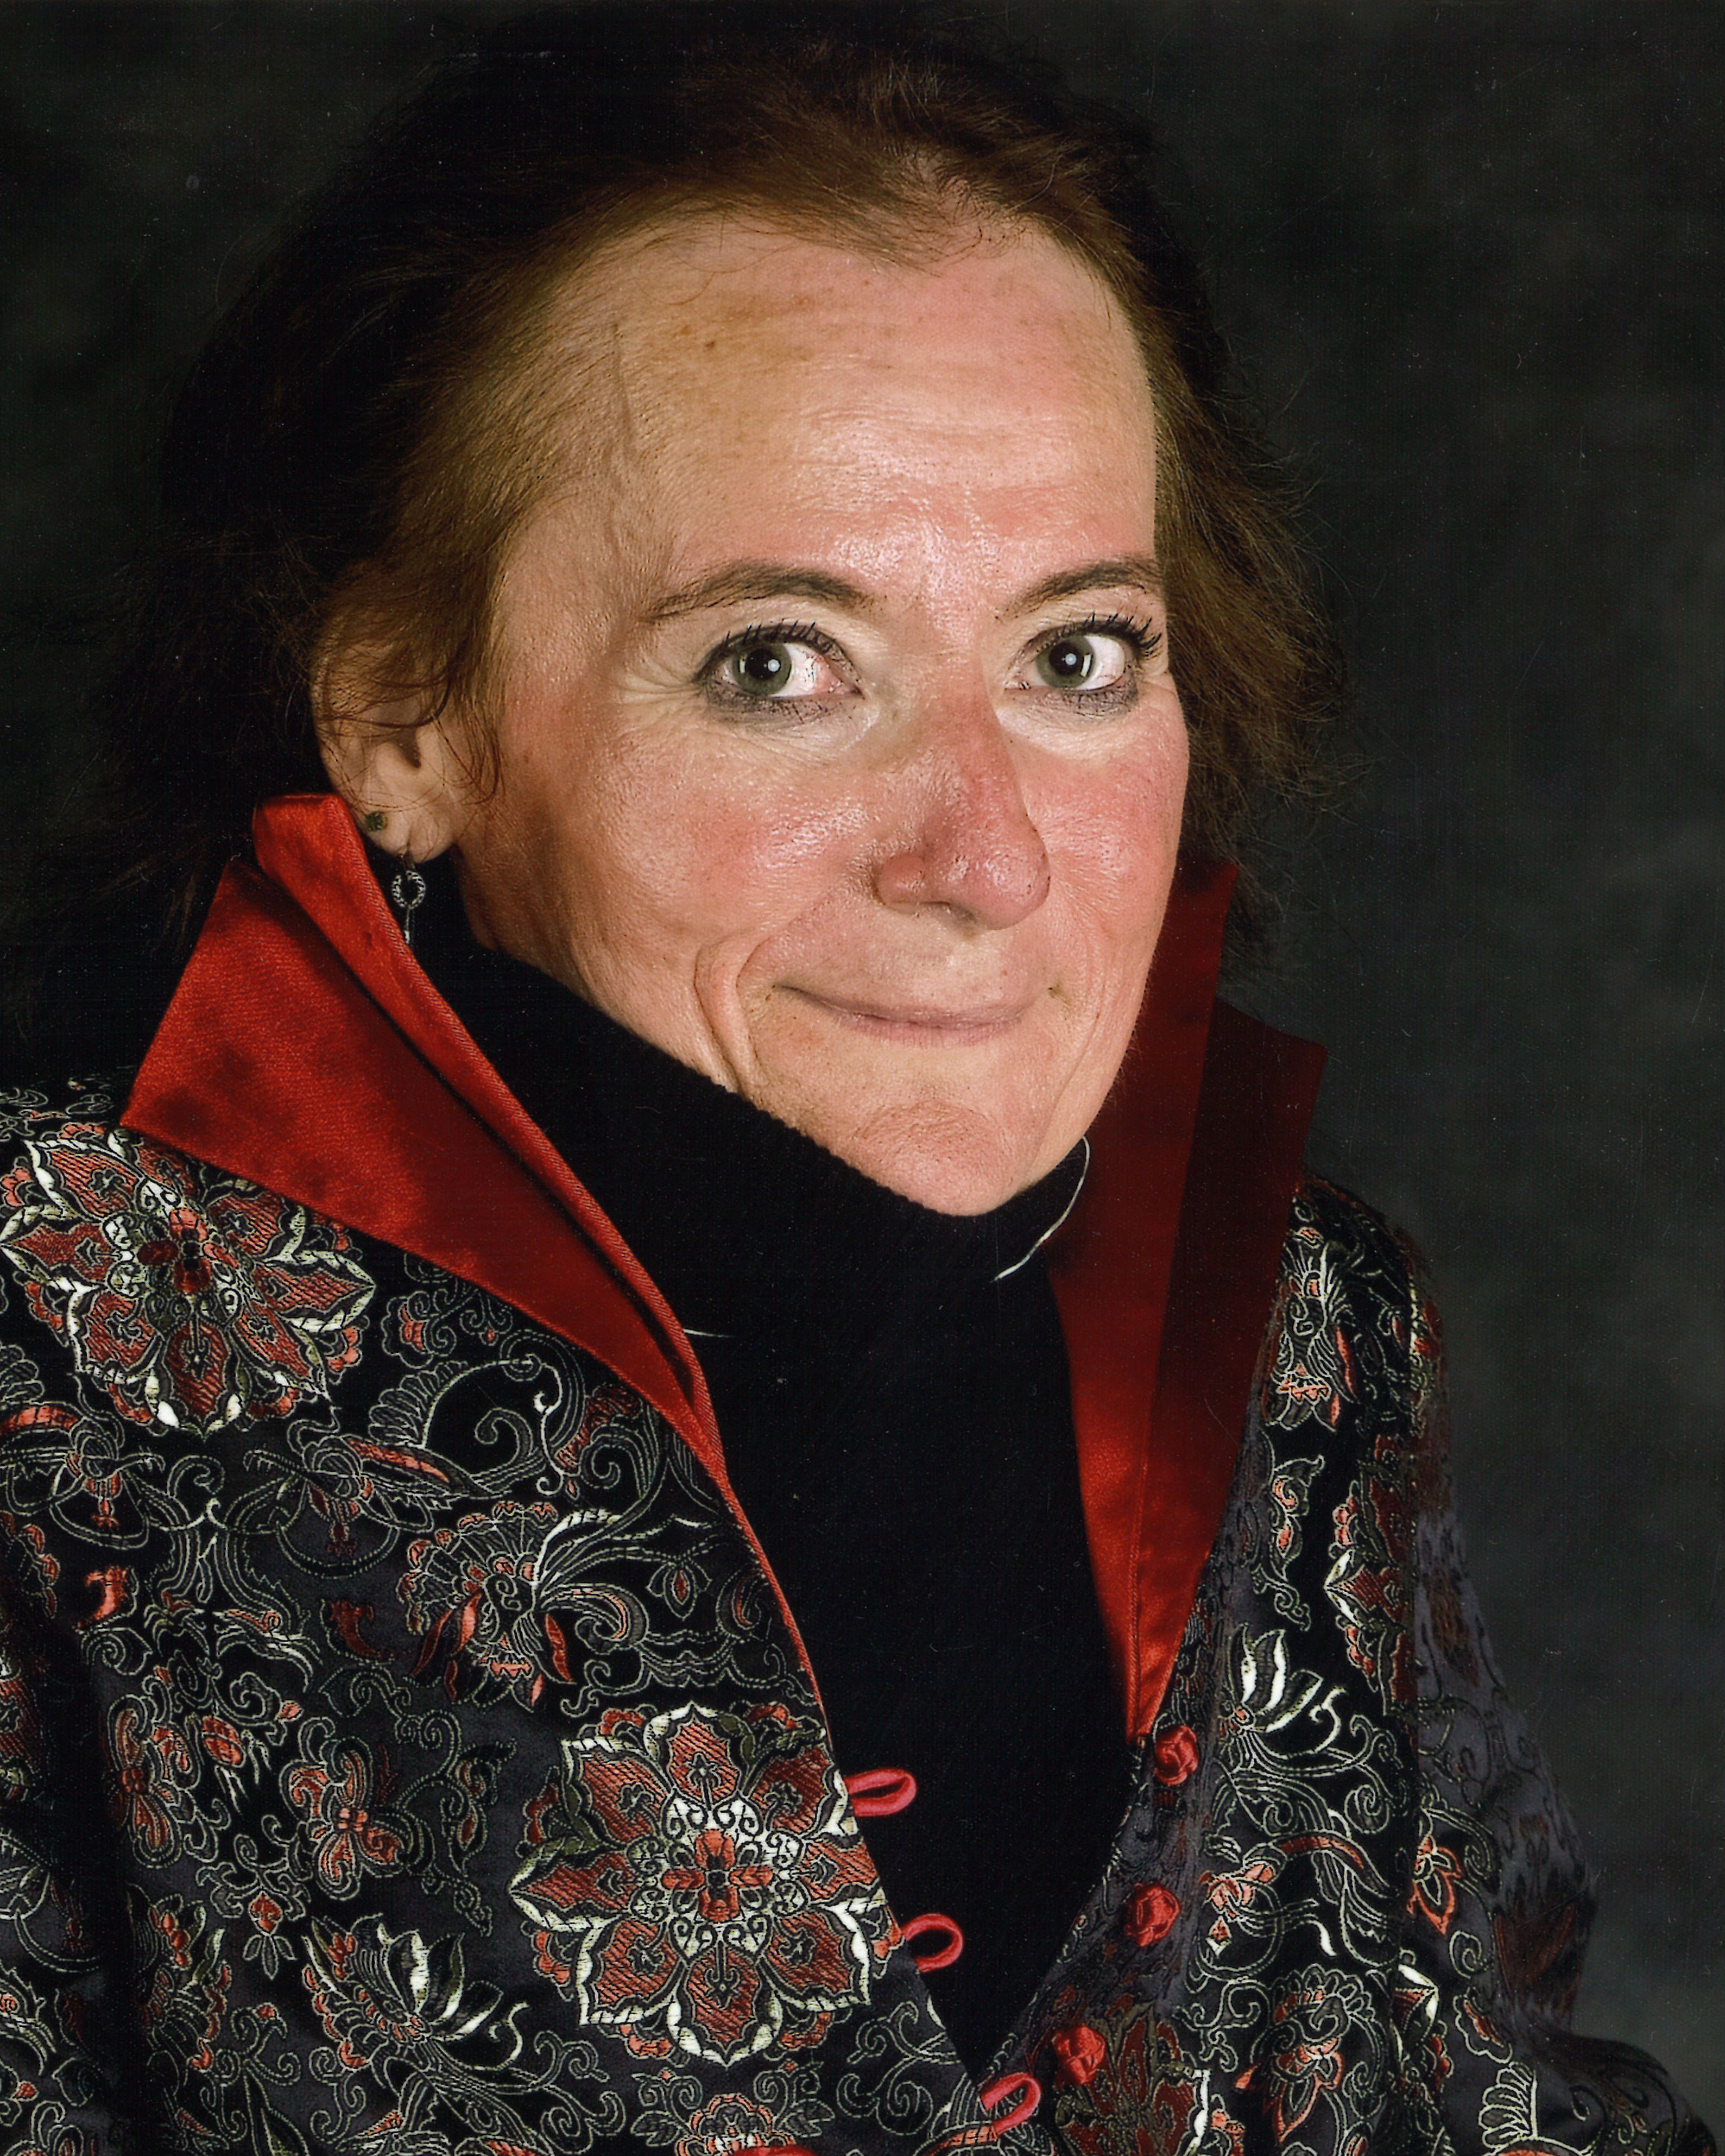 Isabelle Cerretti